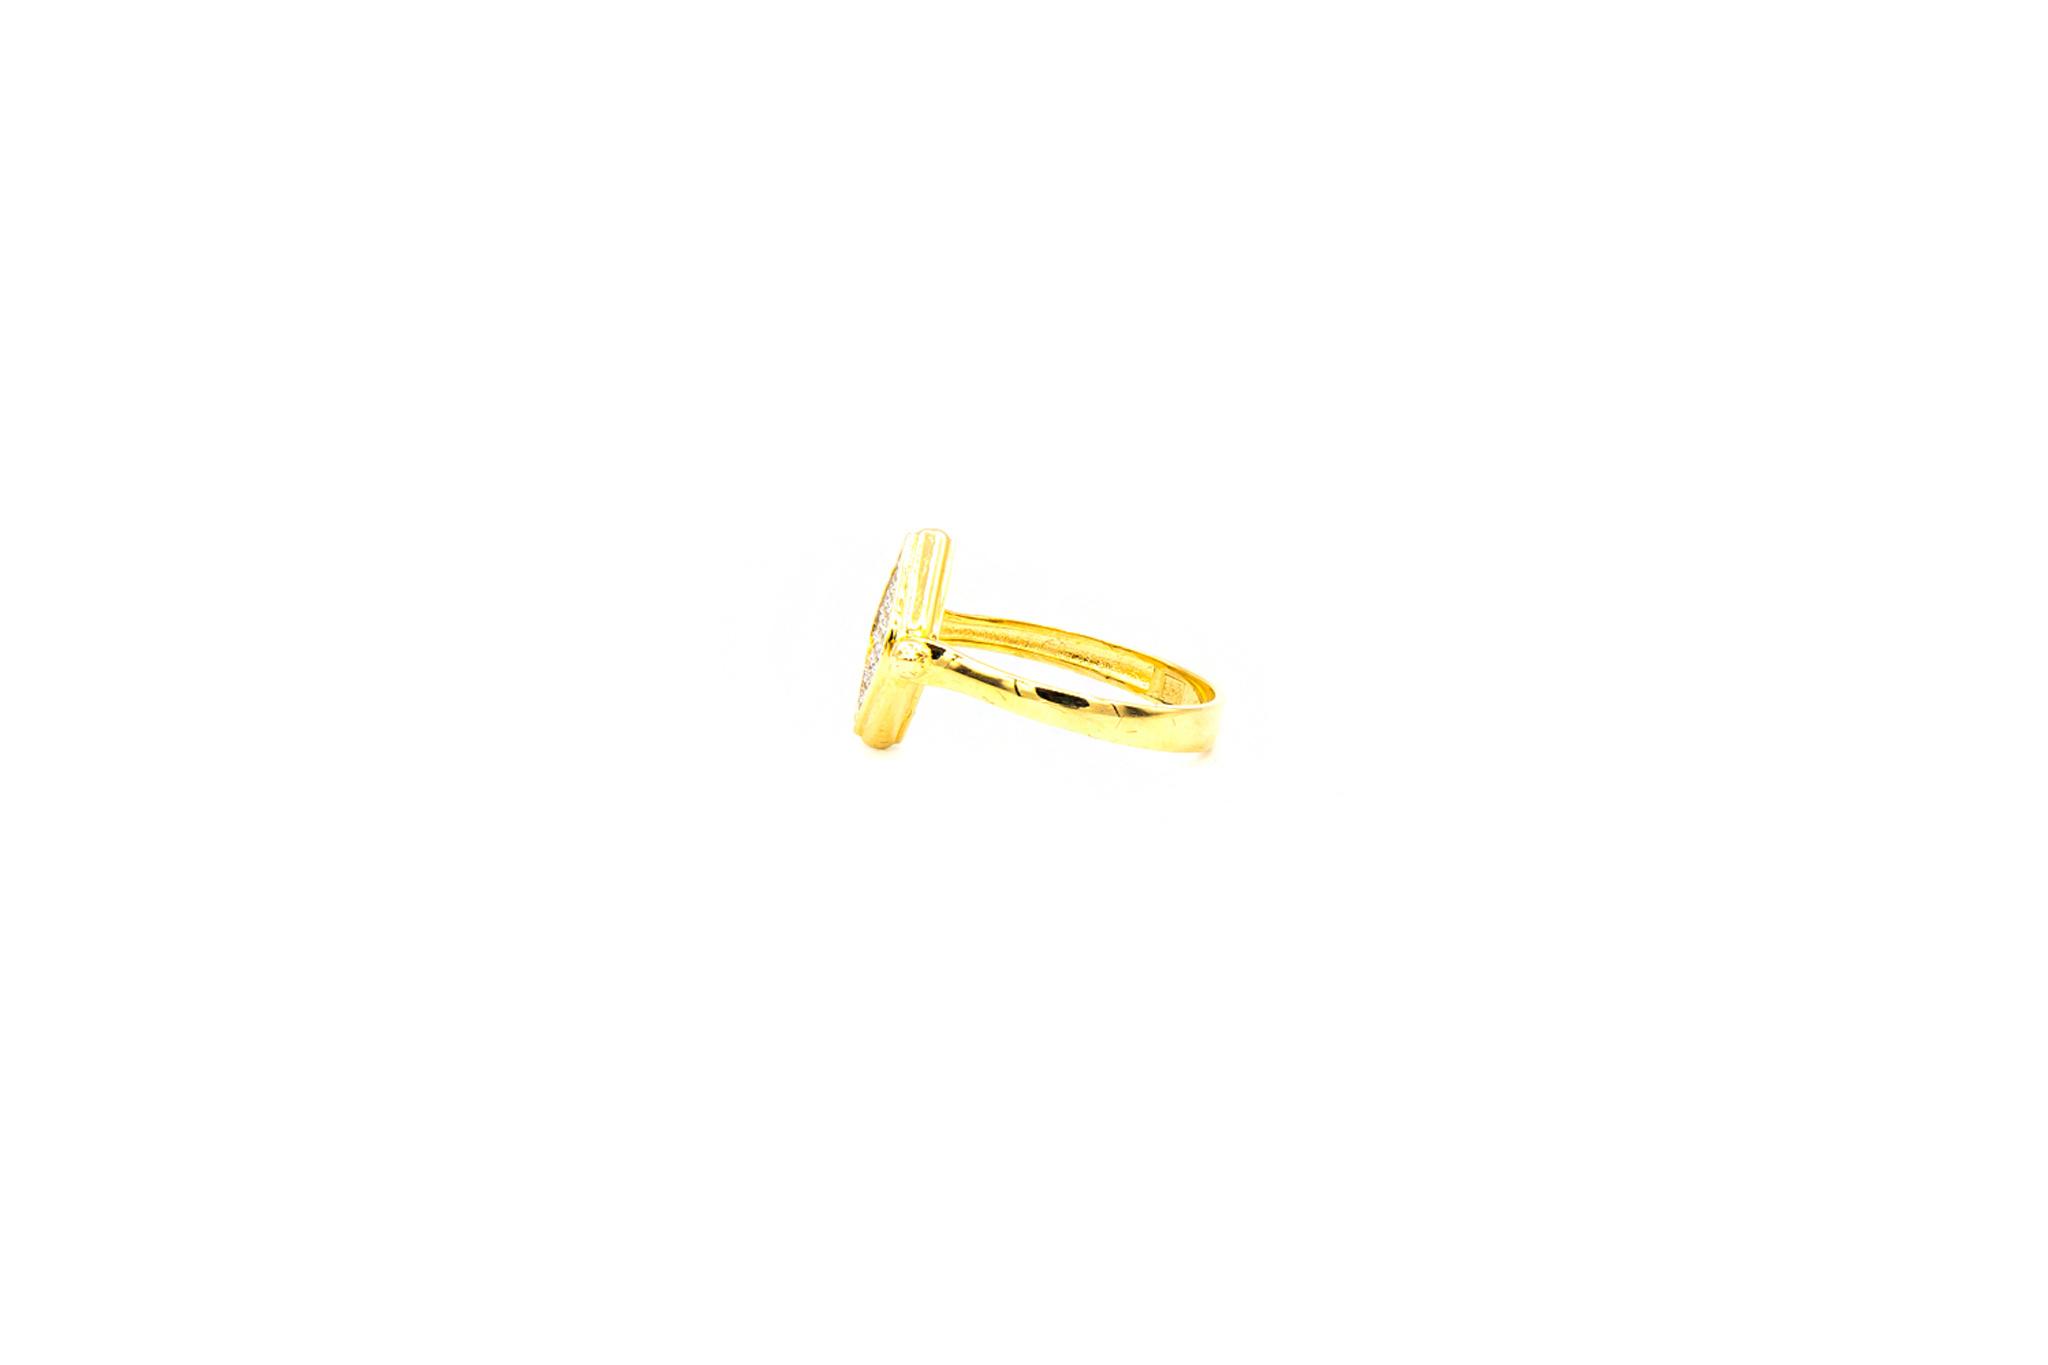 Ring beweegbare kop ruit-3